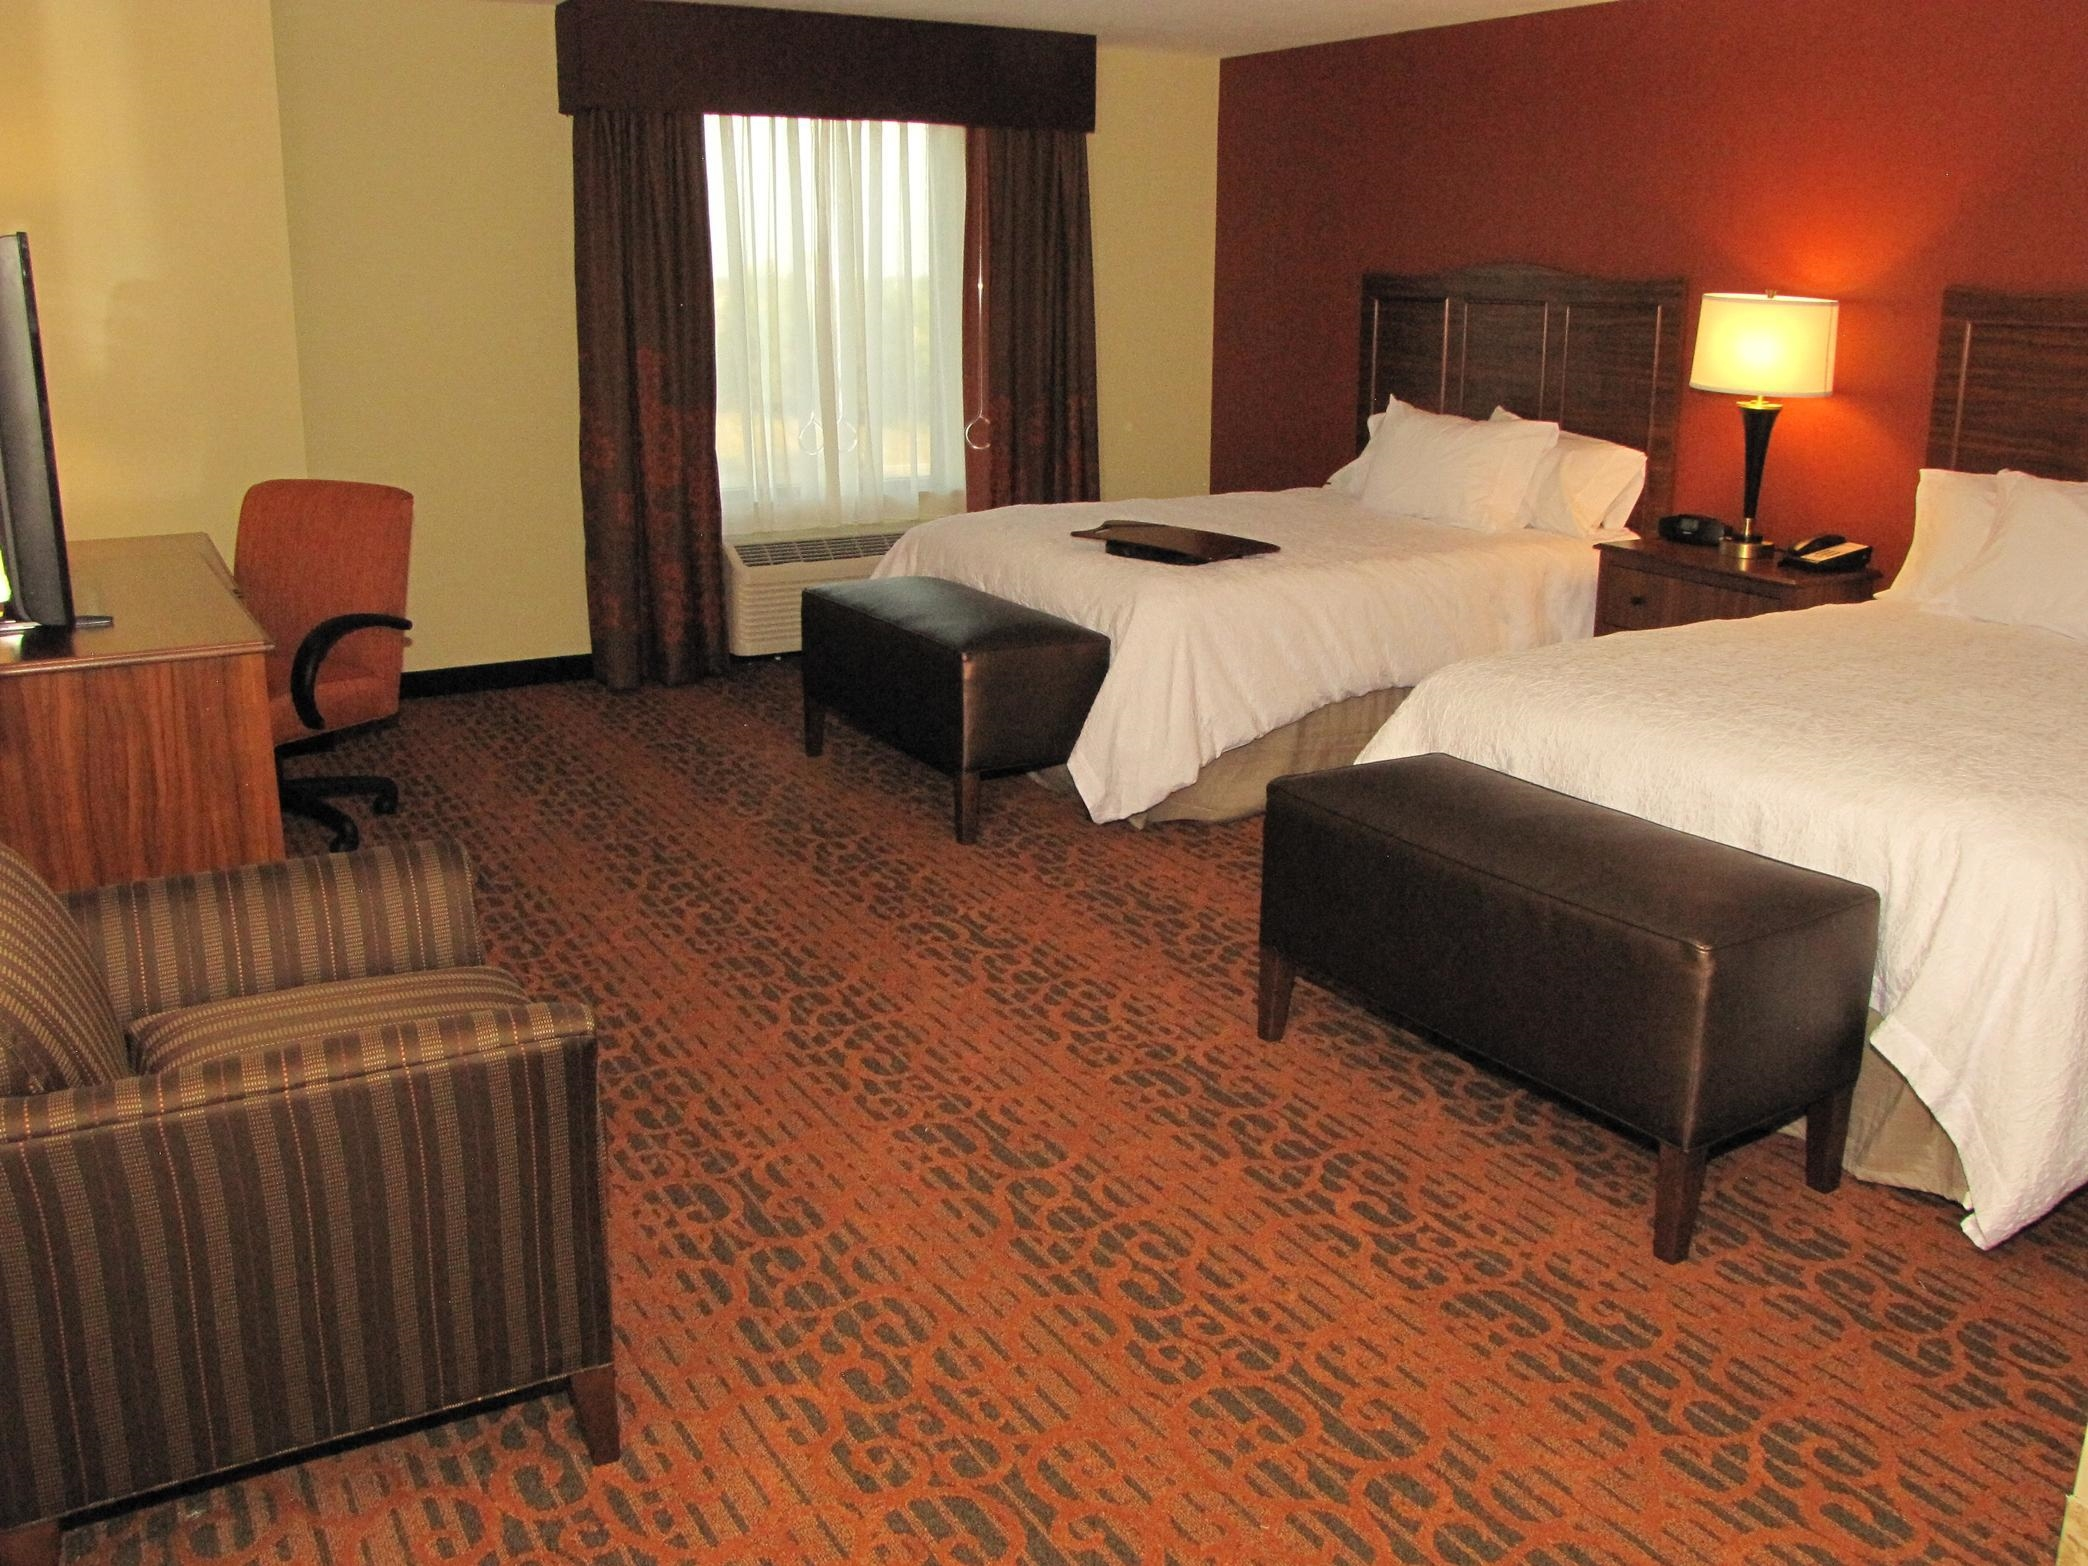 Hampton Inn & Suites Jamestown, ND image 5